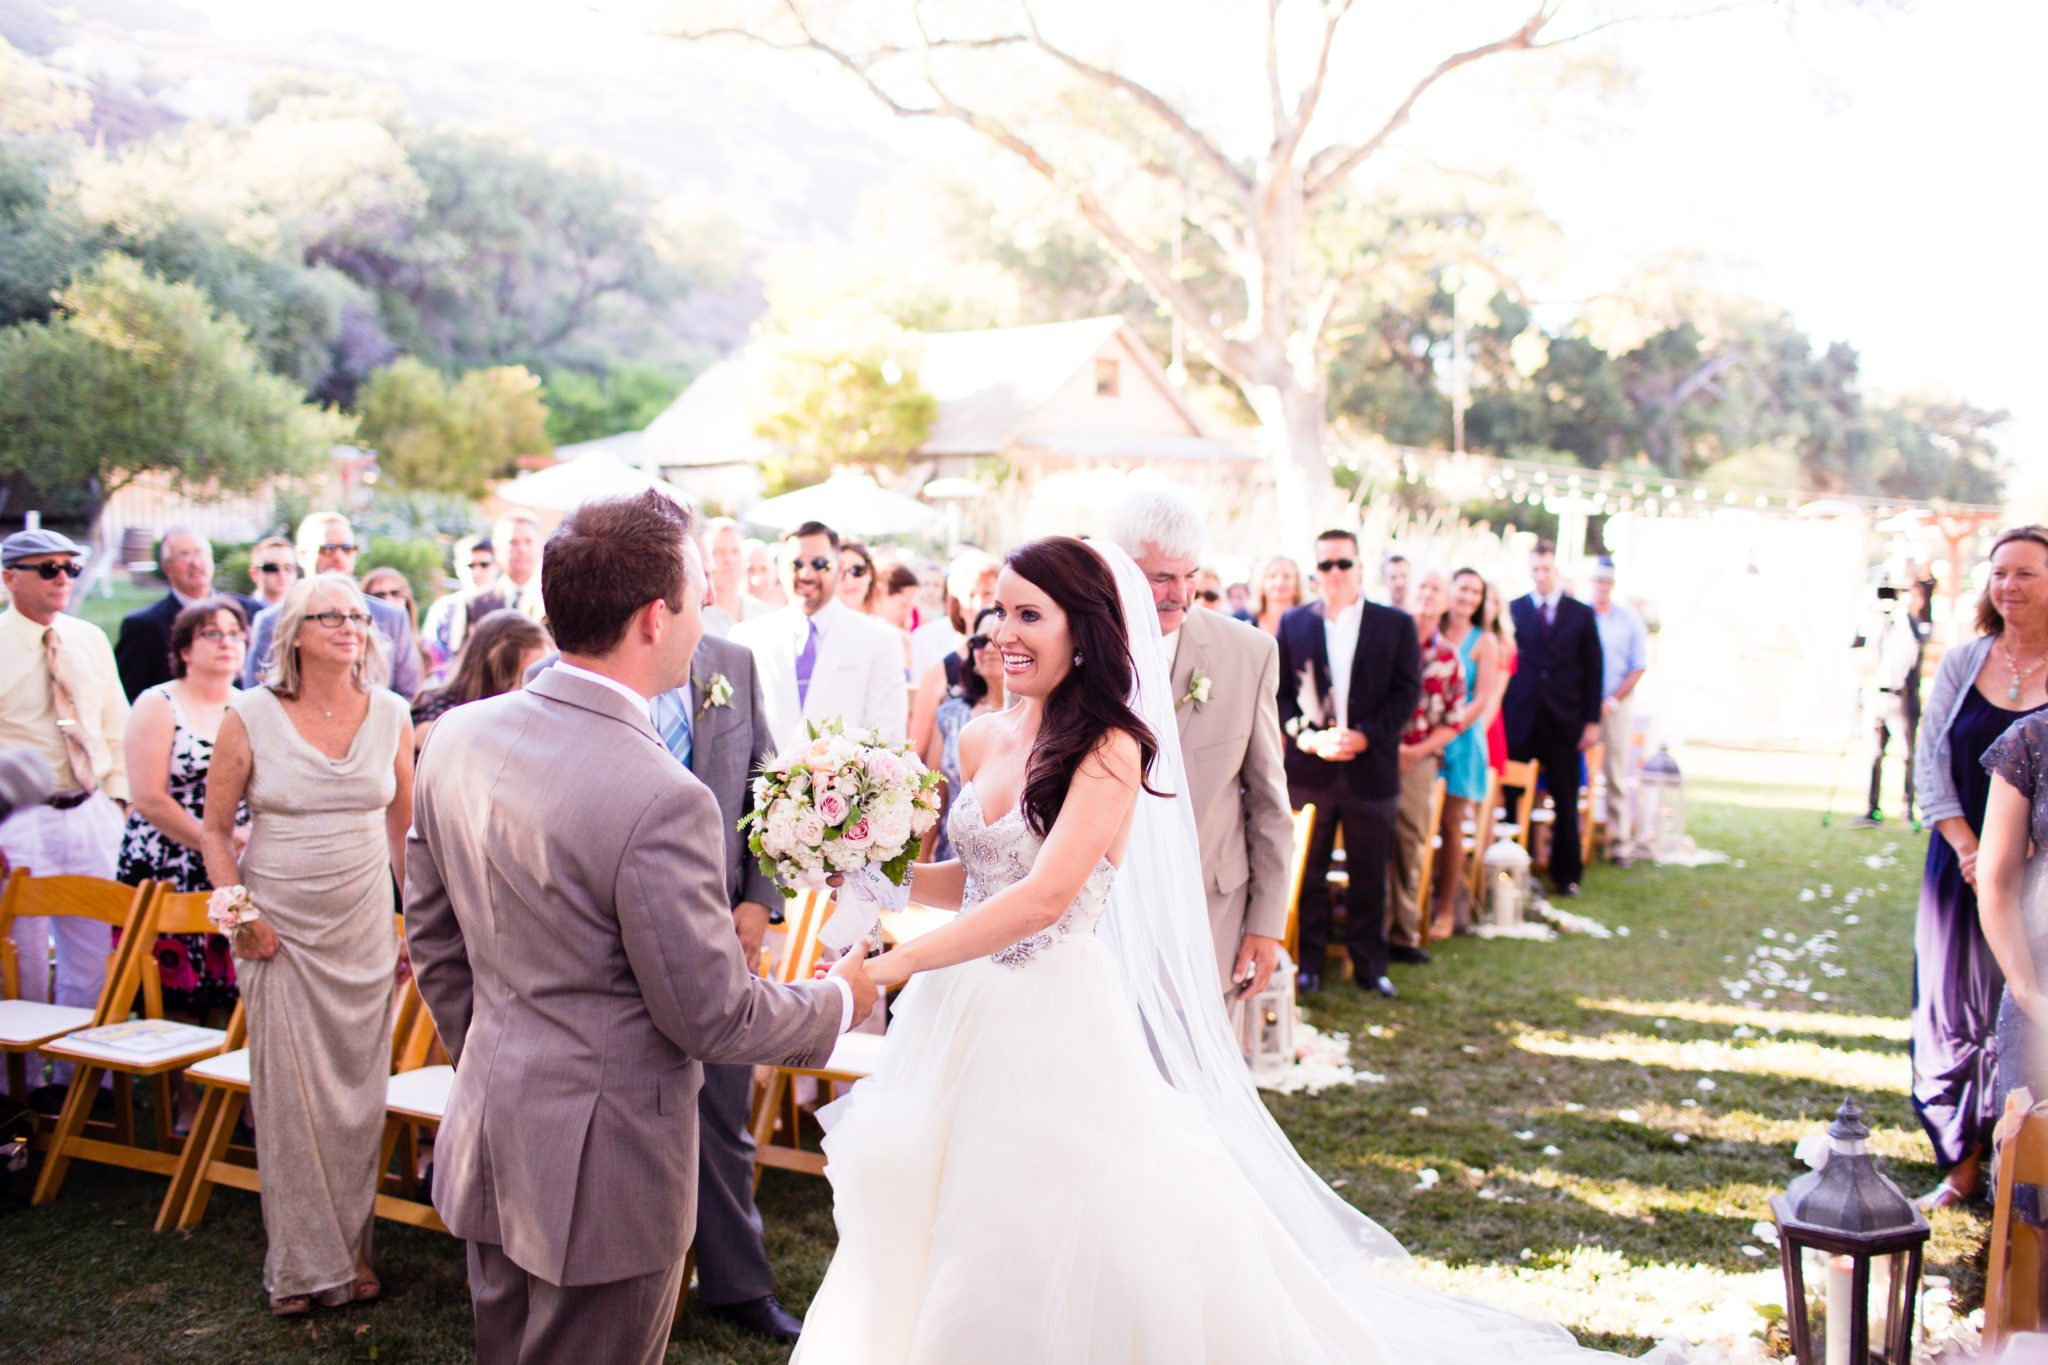 Temecula_Creek_Inn_Wedding_079.jpg